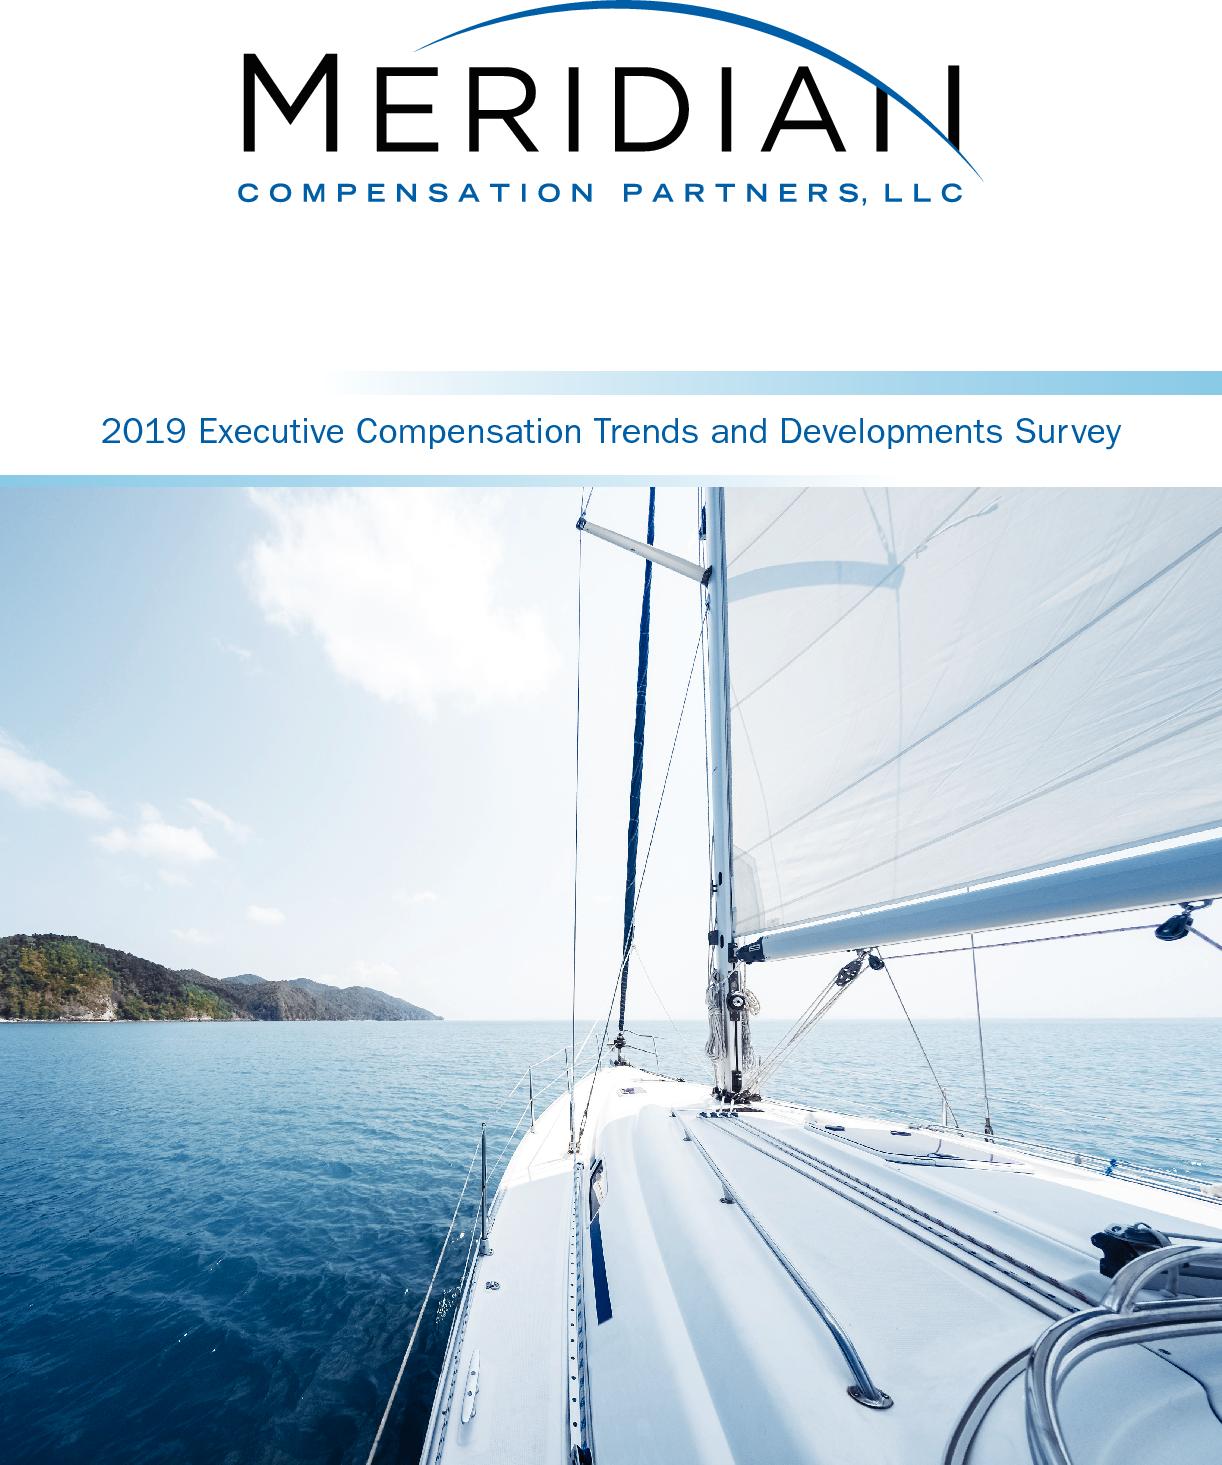 2019 Executive Compensation Trends and Developments (PDF)